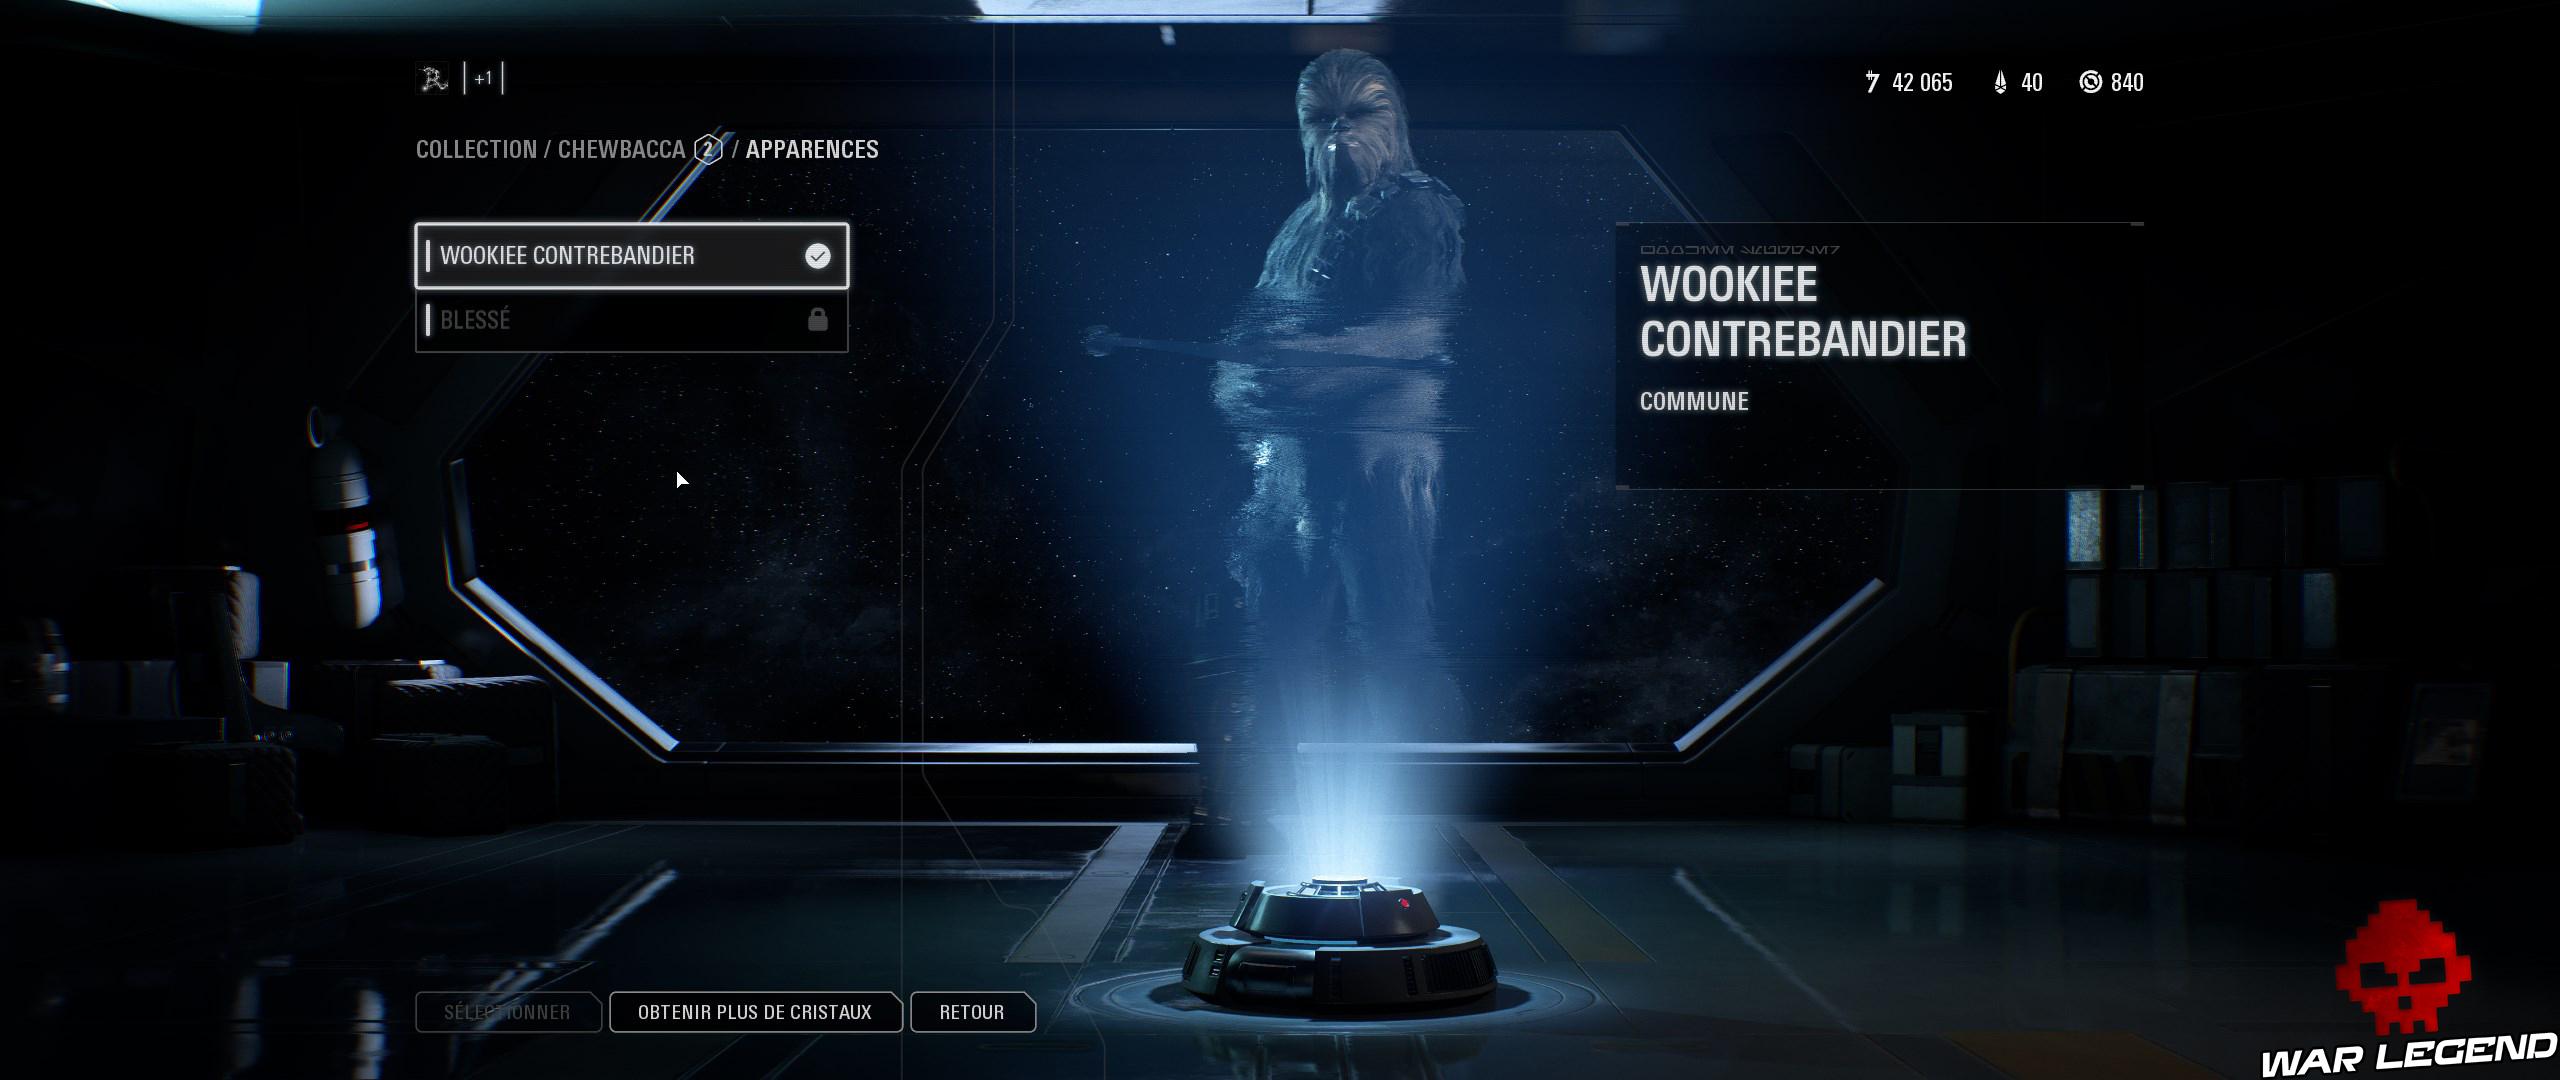 ReTest Star Wars Battlefront II skin chewbacca